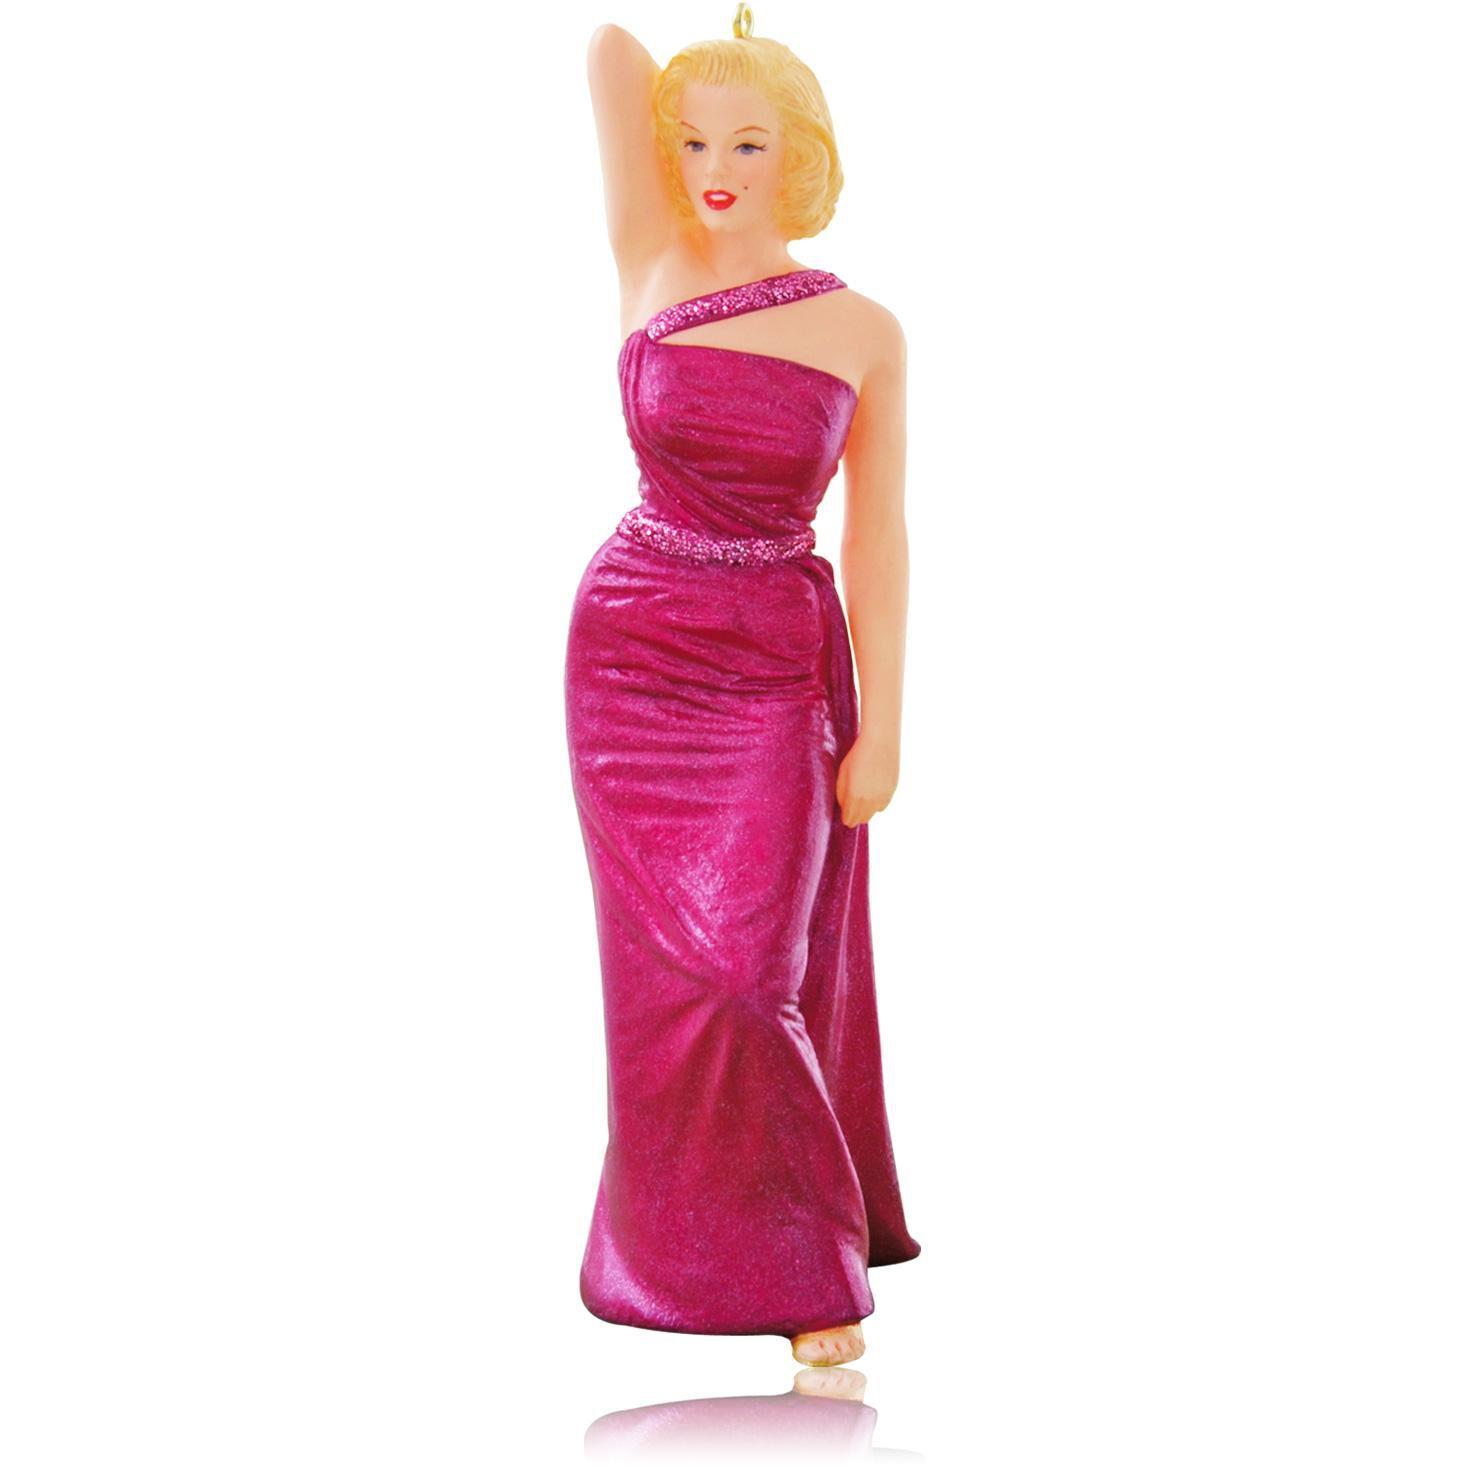 Marilyn monroe ornaments - Marilyn Monroe Ornaments 25